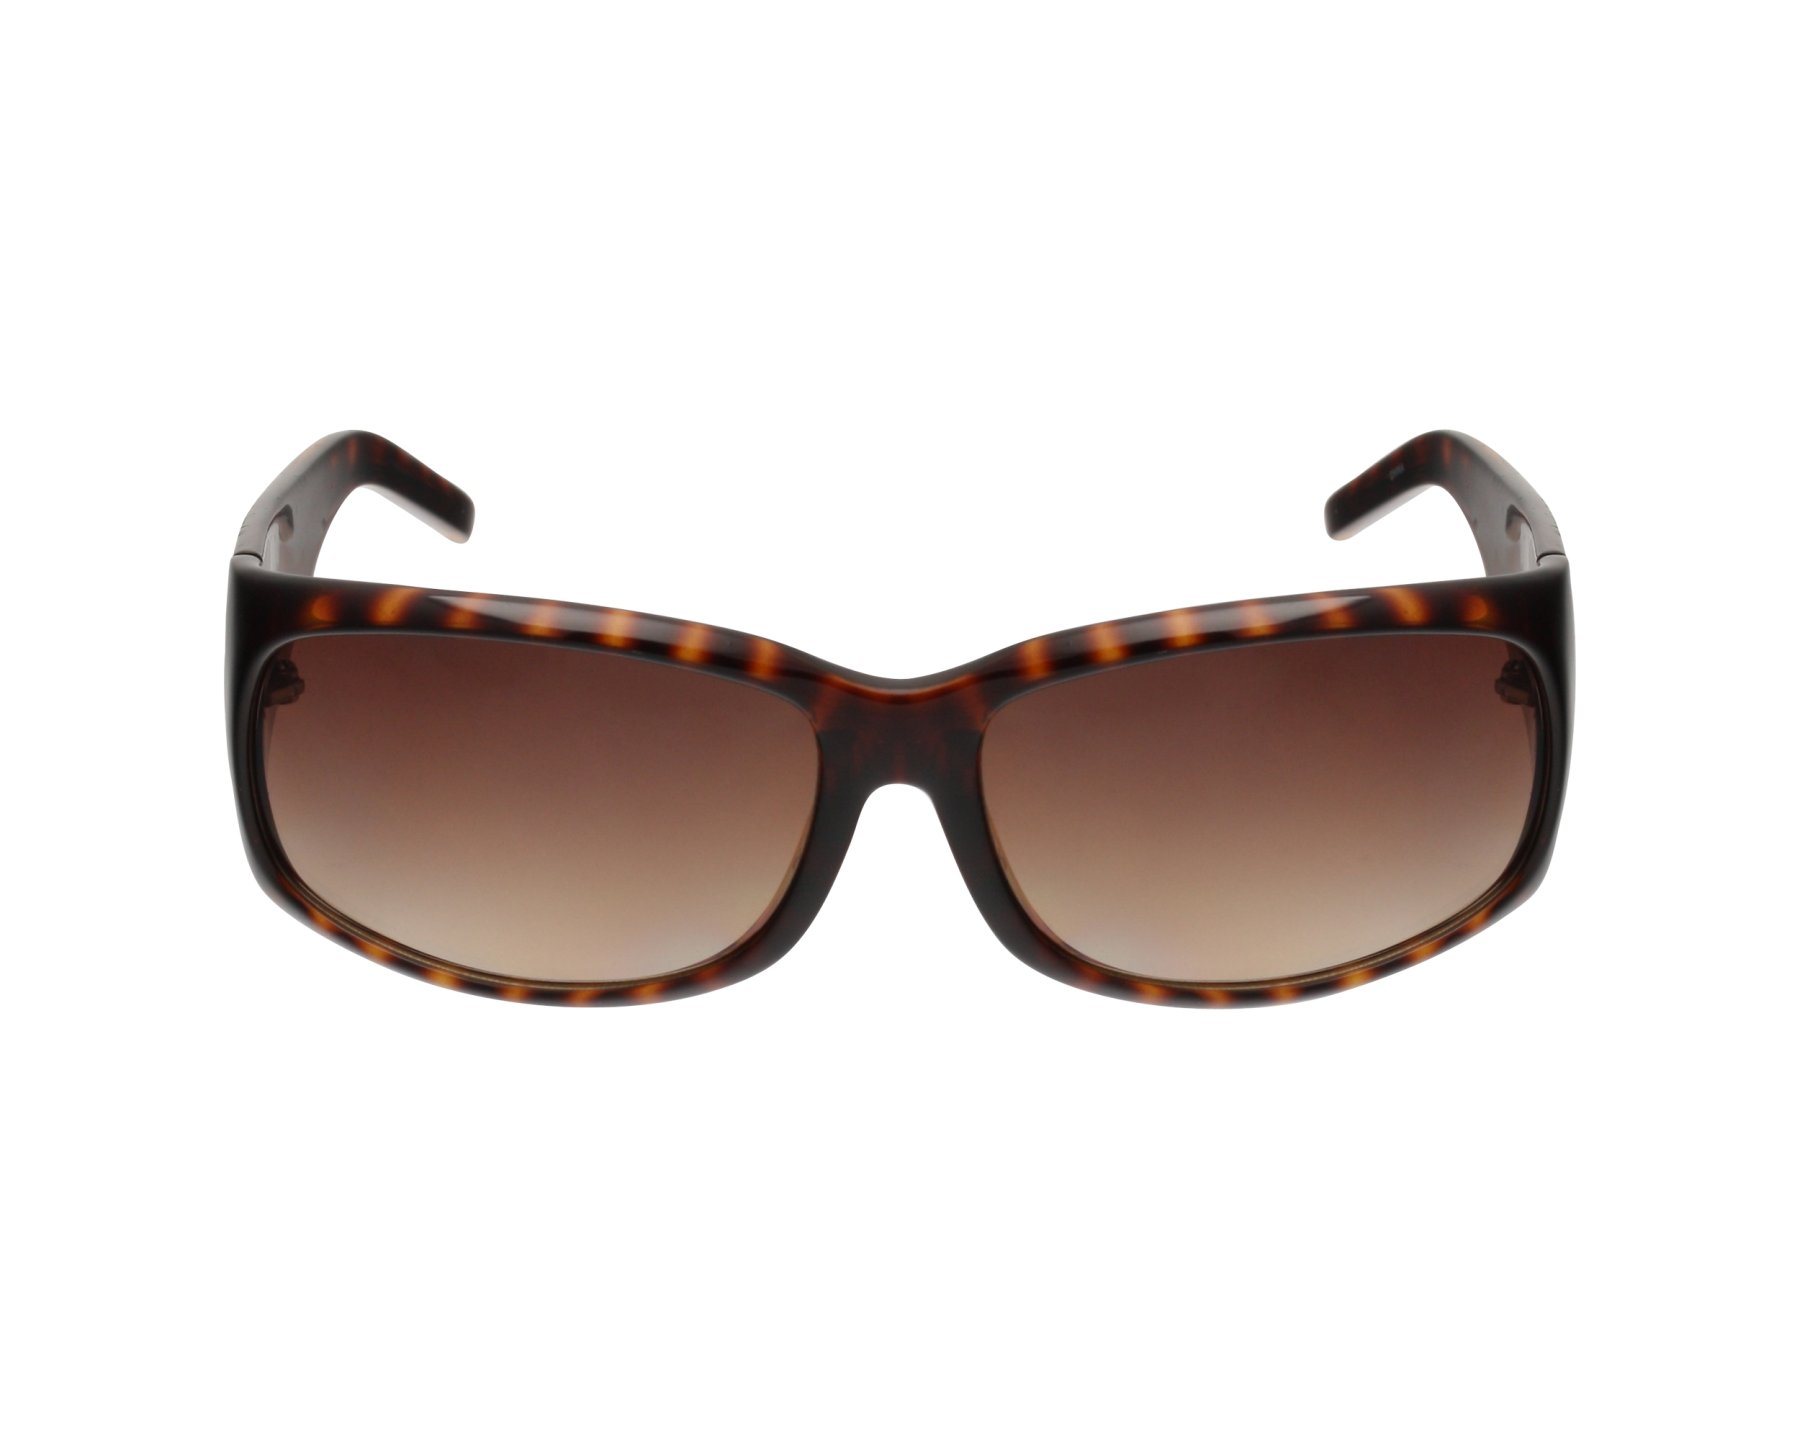 Michael Kors Grayson Sunglasses  michael kors sunglasses grayson m2777s 206 56 visionet